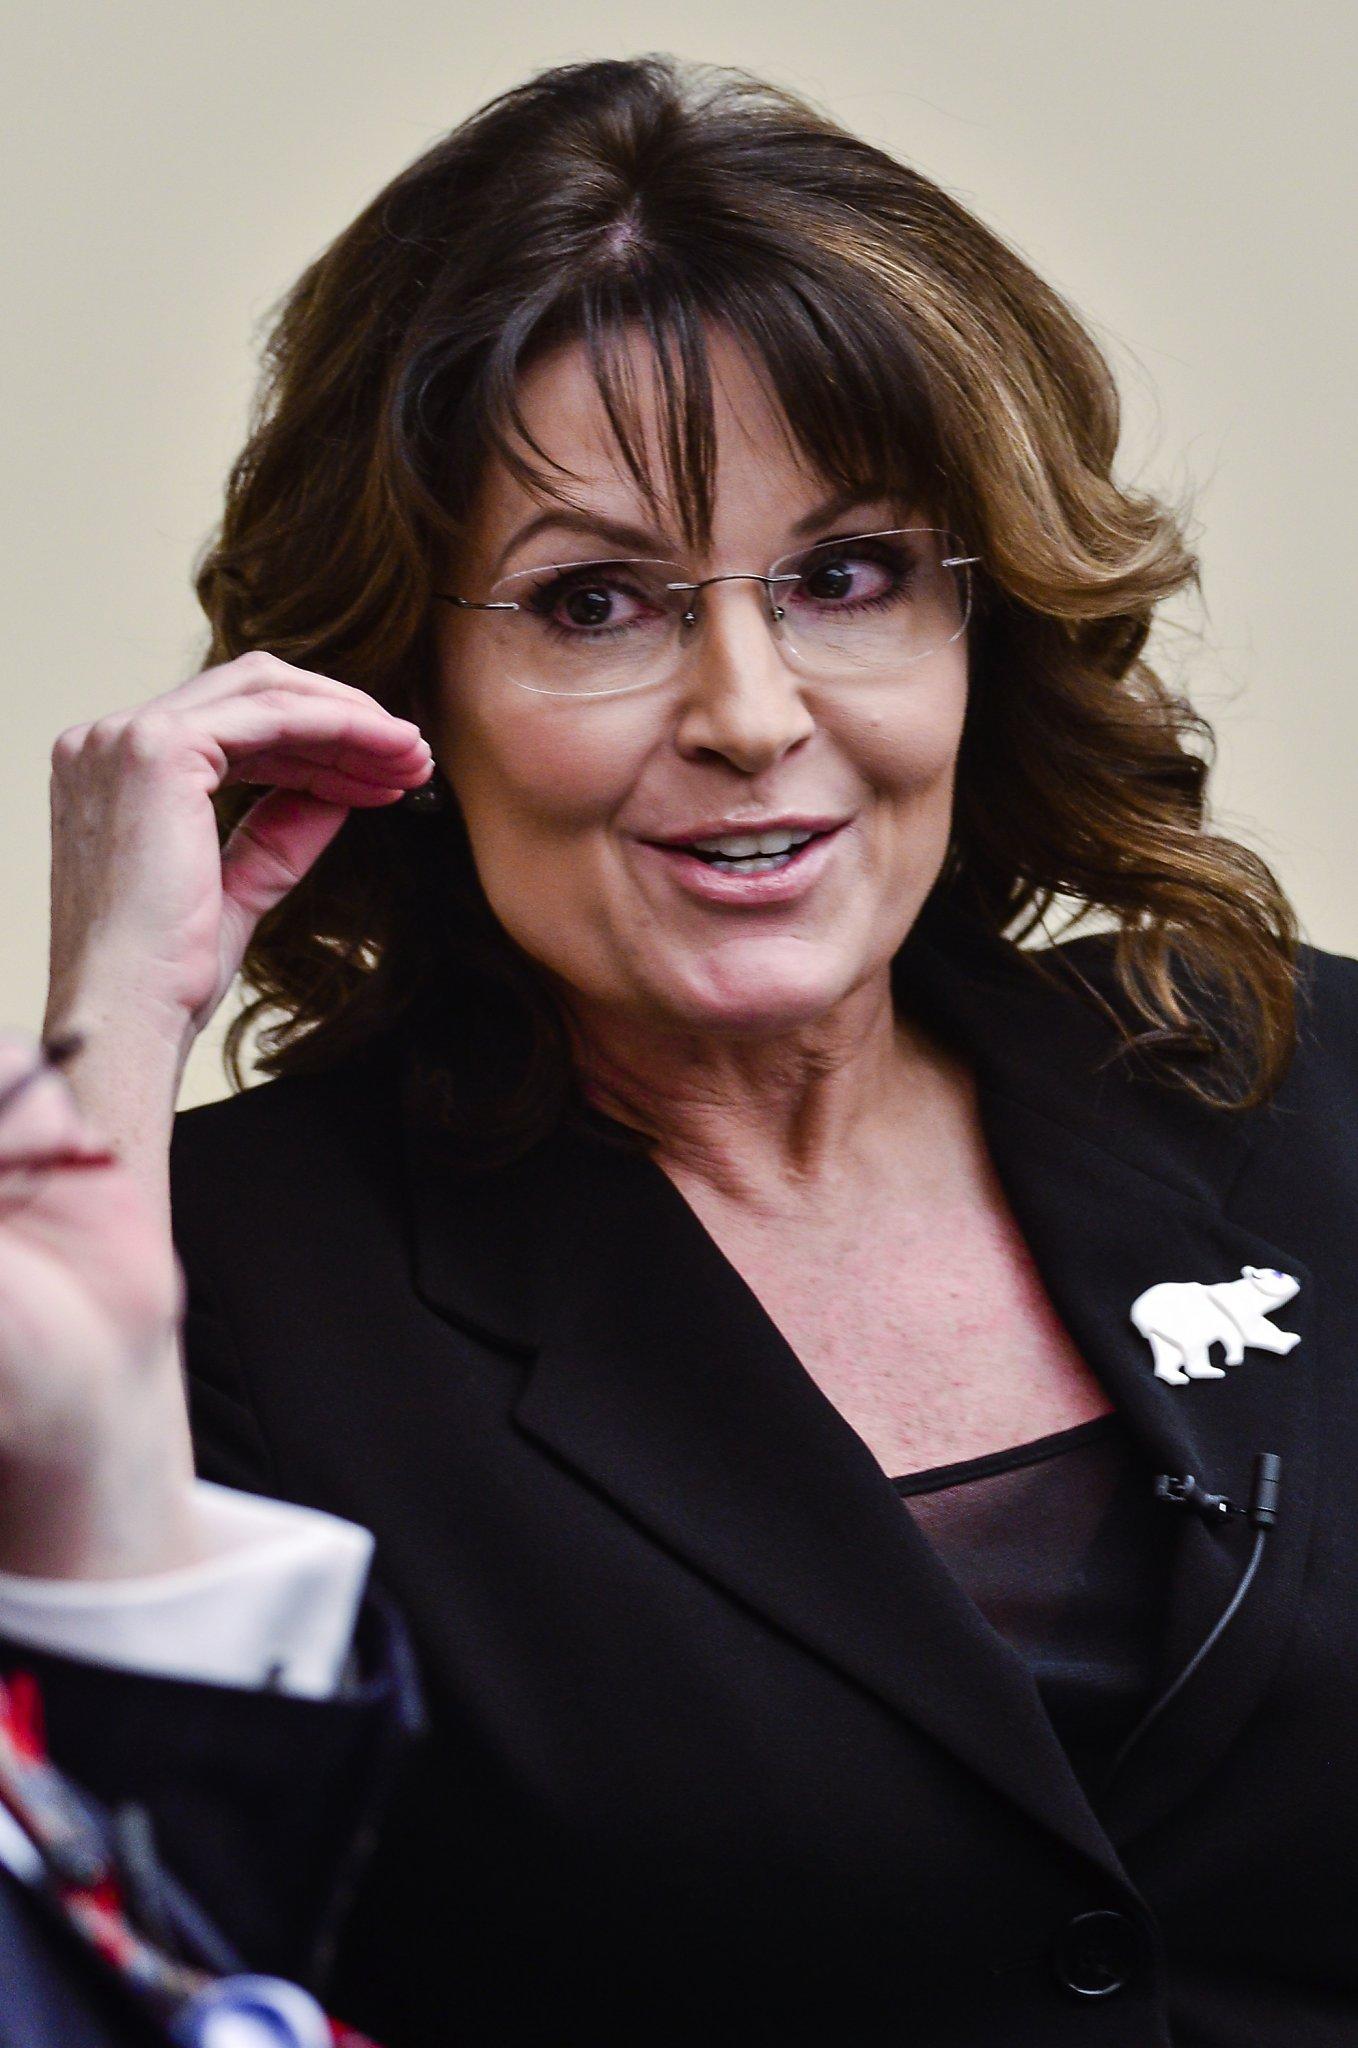 Sarah Louise Palin IPA ˈpeɪlɨn født Heath 11 februar 1964 i Sandpoint i Idaho er en amerikansk republikansk politiker Hun var guvernør i delstaten